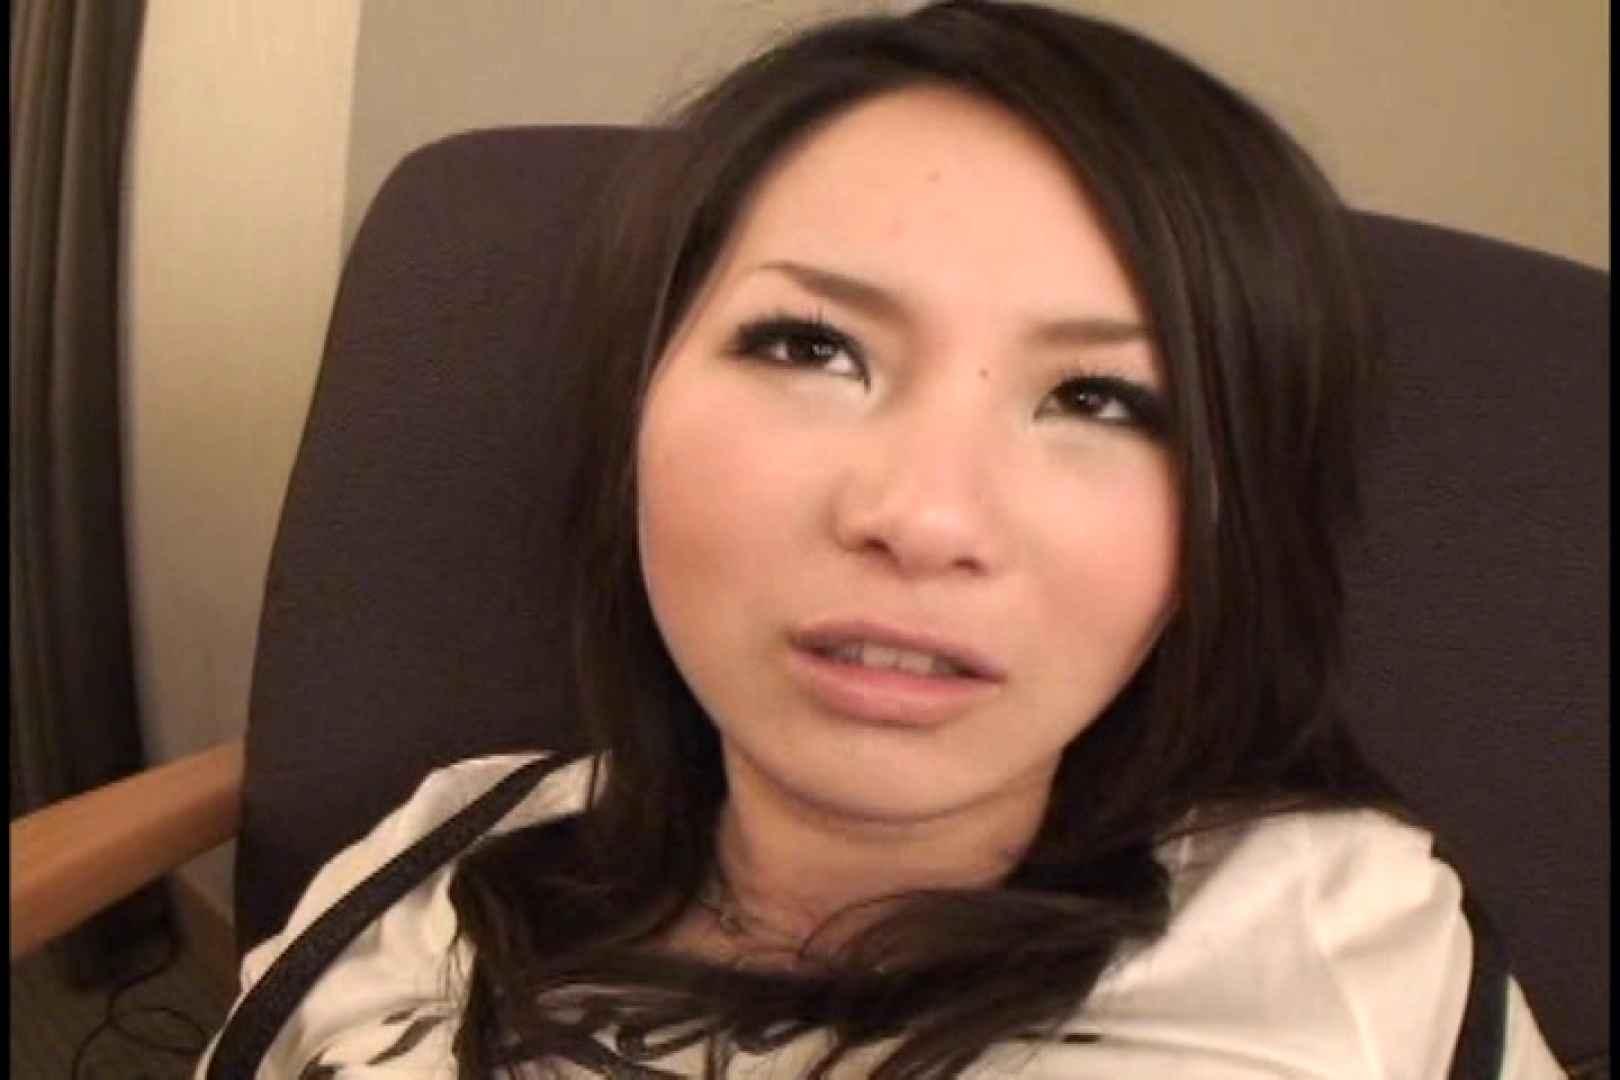 JDハンター全国ツアー vol.045 後編 女子大生のエロ動画  91PIX 78